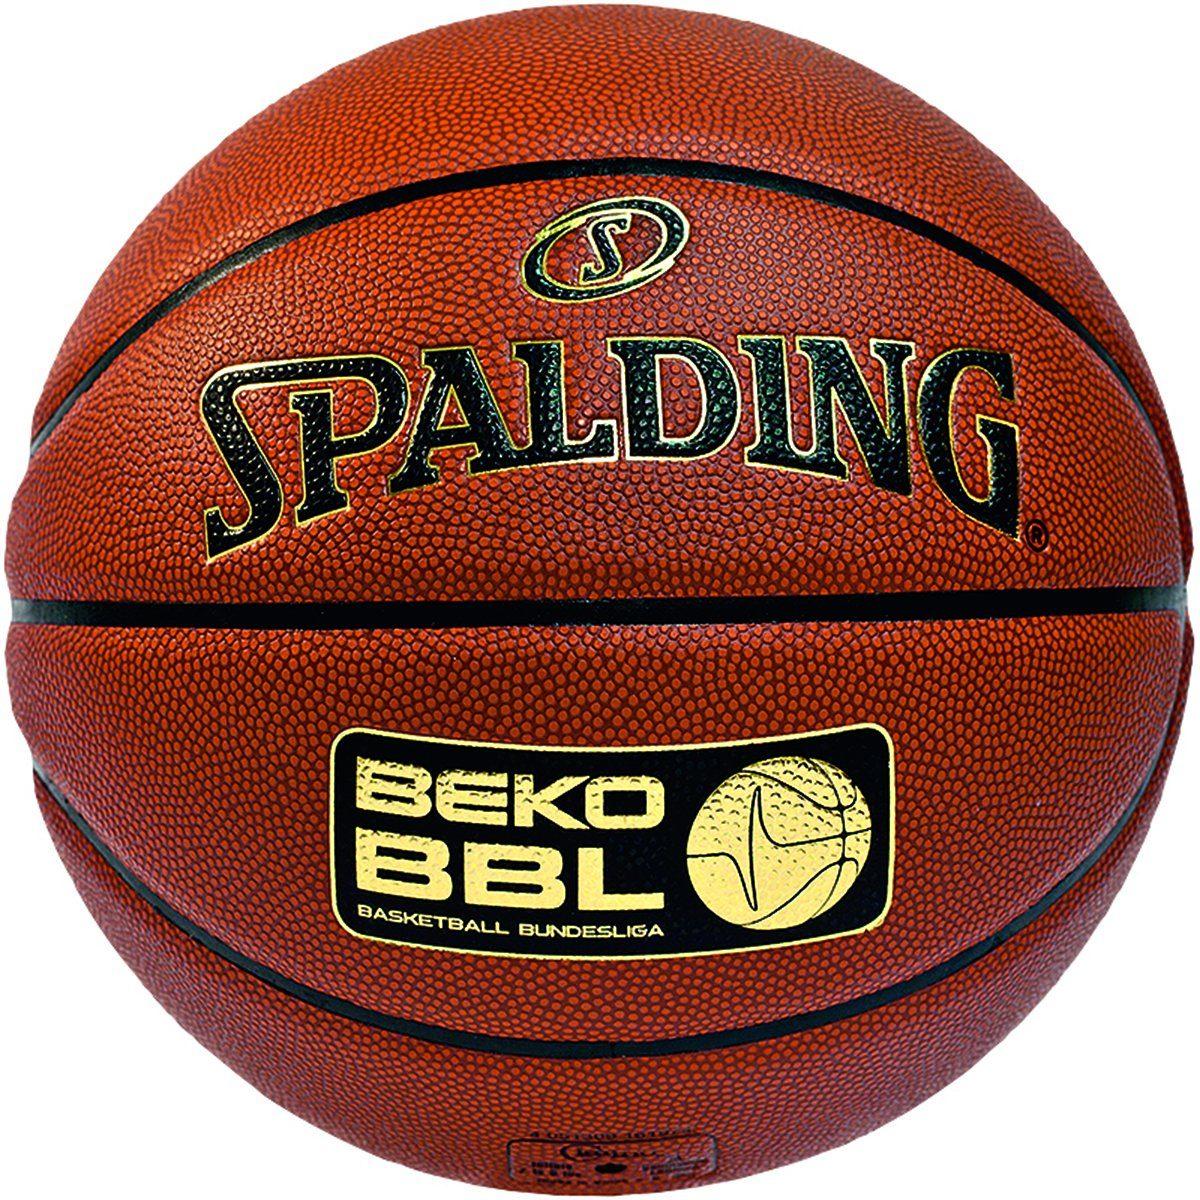 SPALDING BBL TF1000 Legacy FIBA Basketball